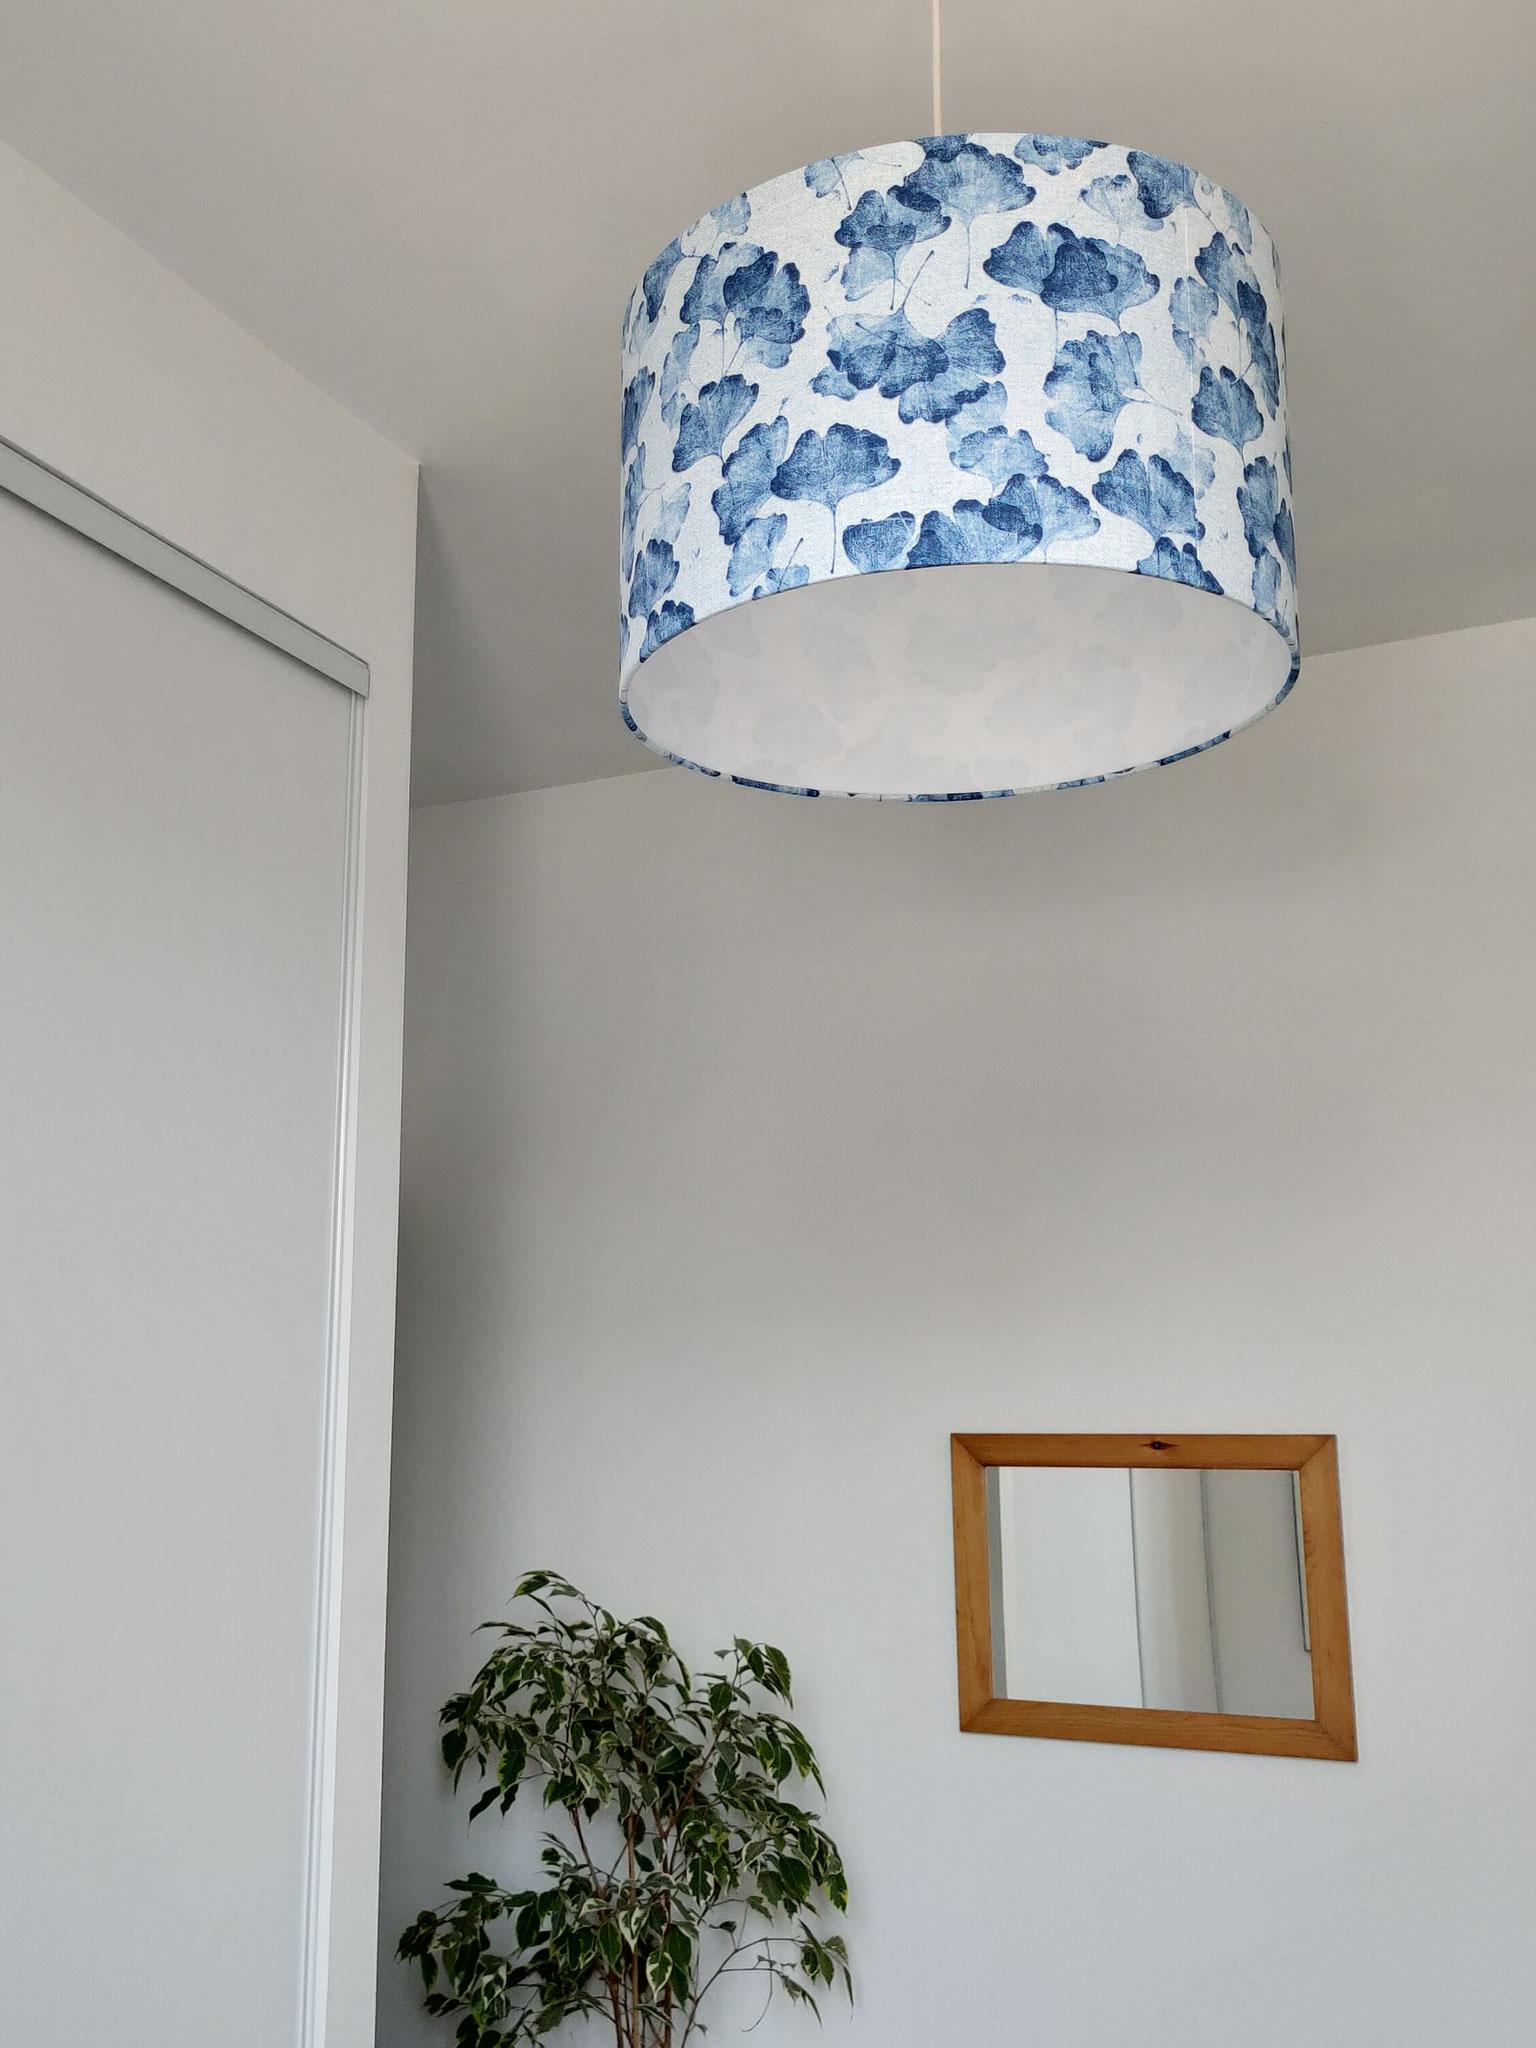 Abat-jour Gingko Bleu dans une chambre